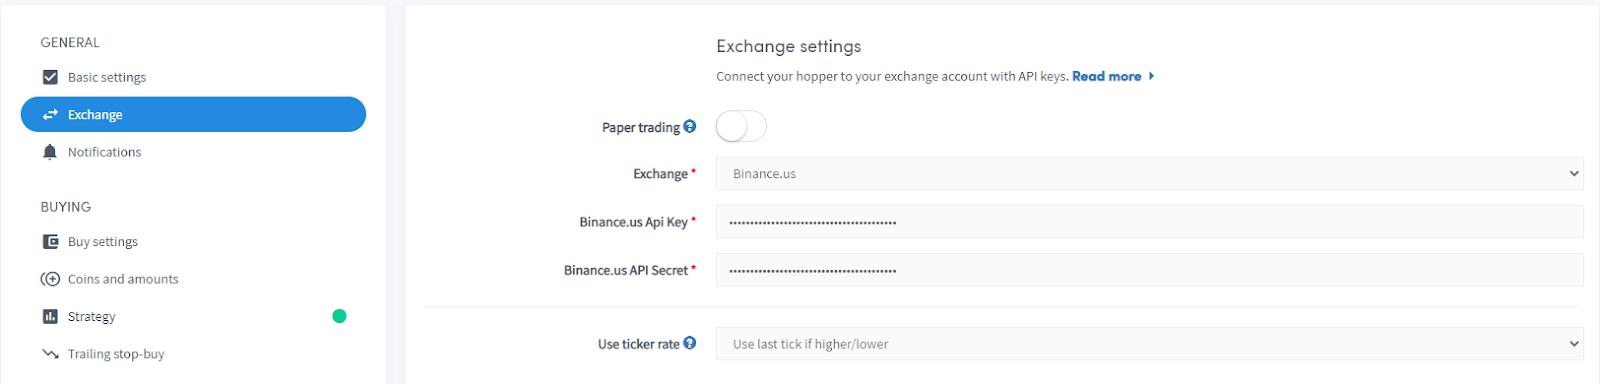 Binance CZ US exchange pro Automated automatic trading bot platform crypto cryptocurrencies Cryptohopper bitcoin ethereum